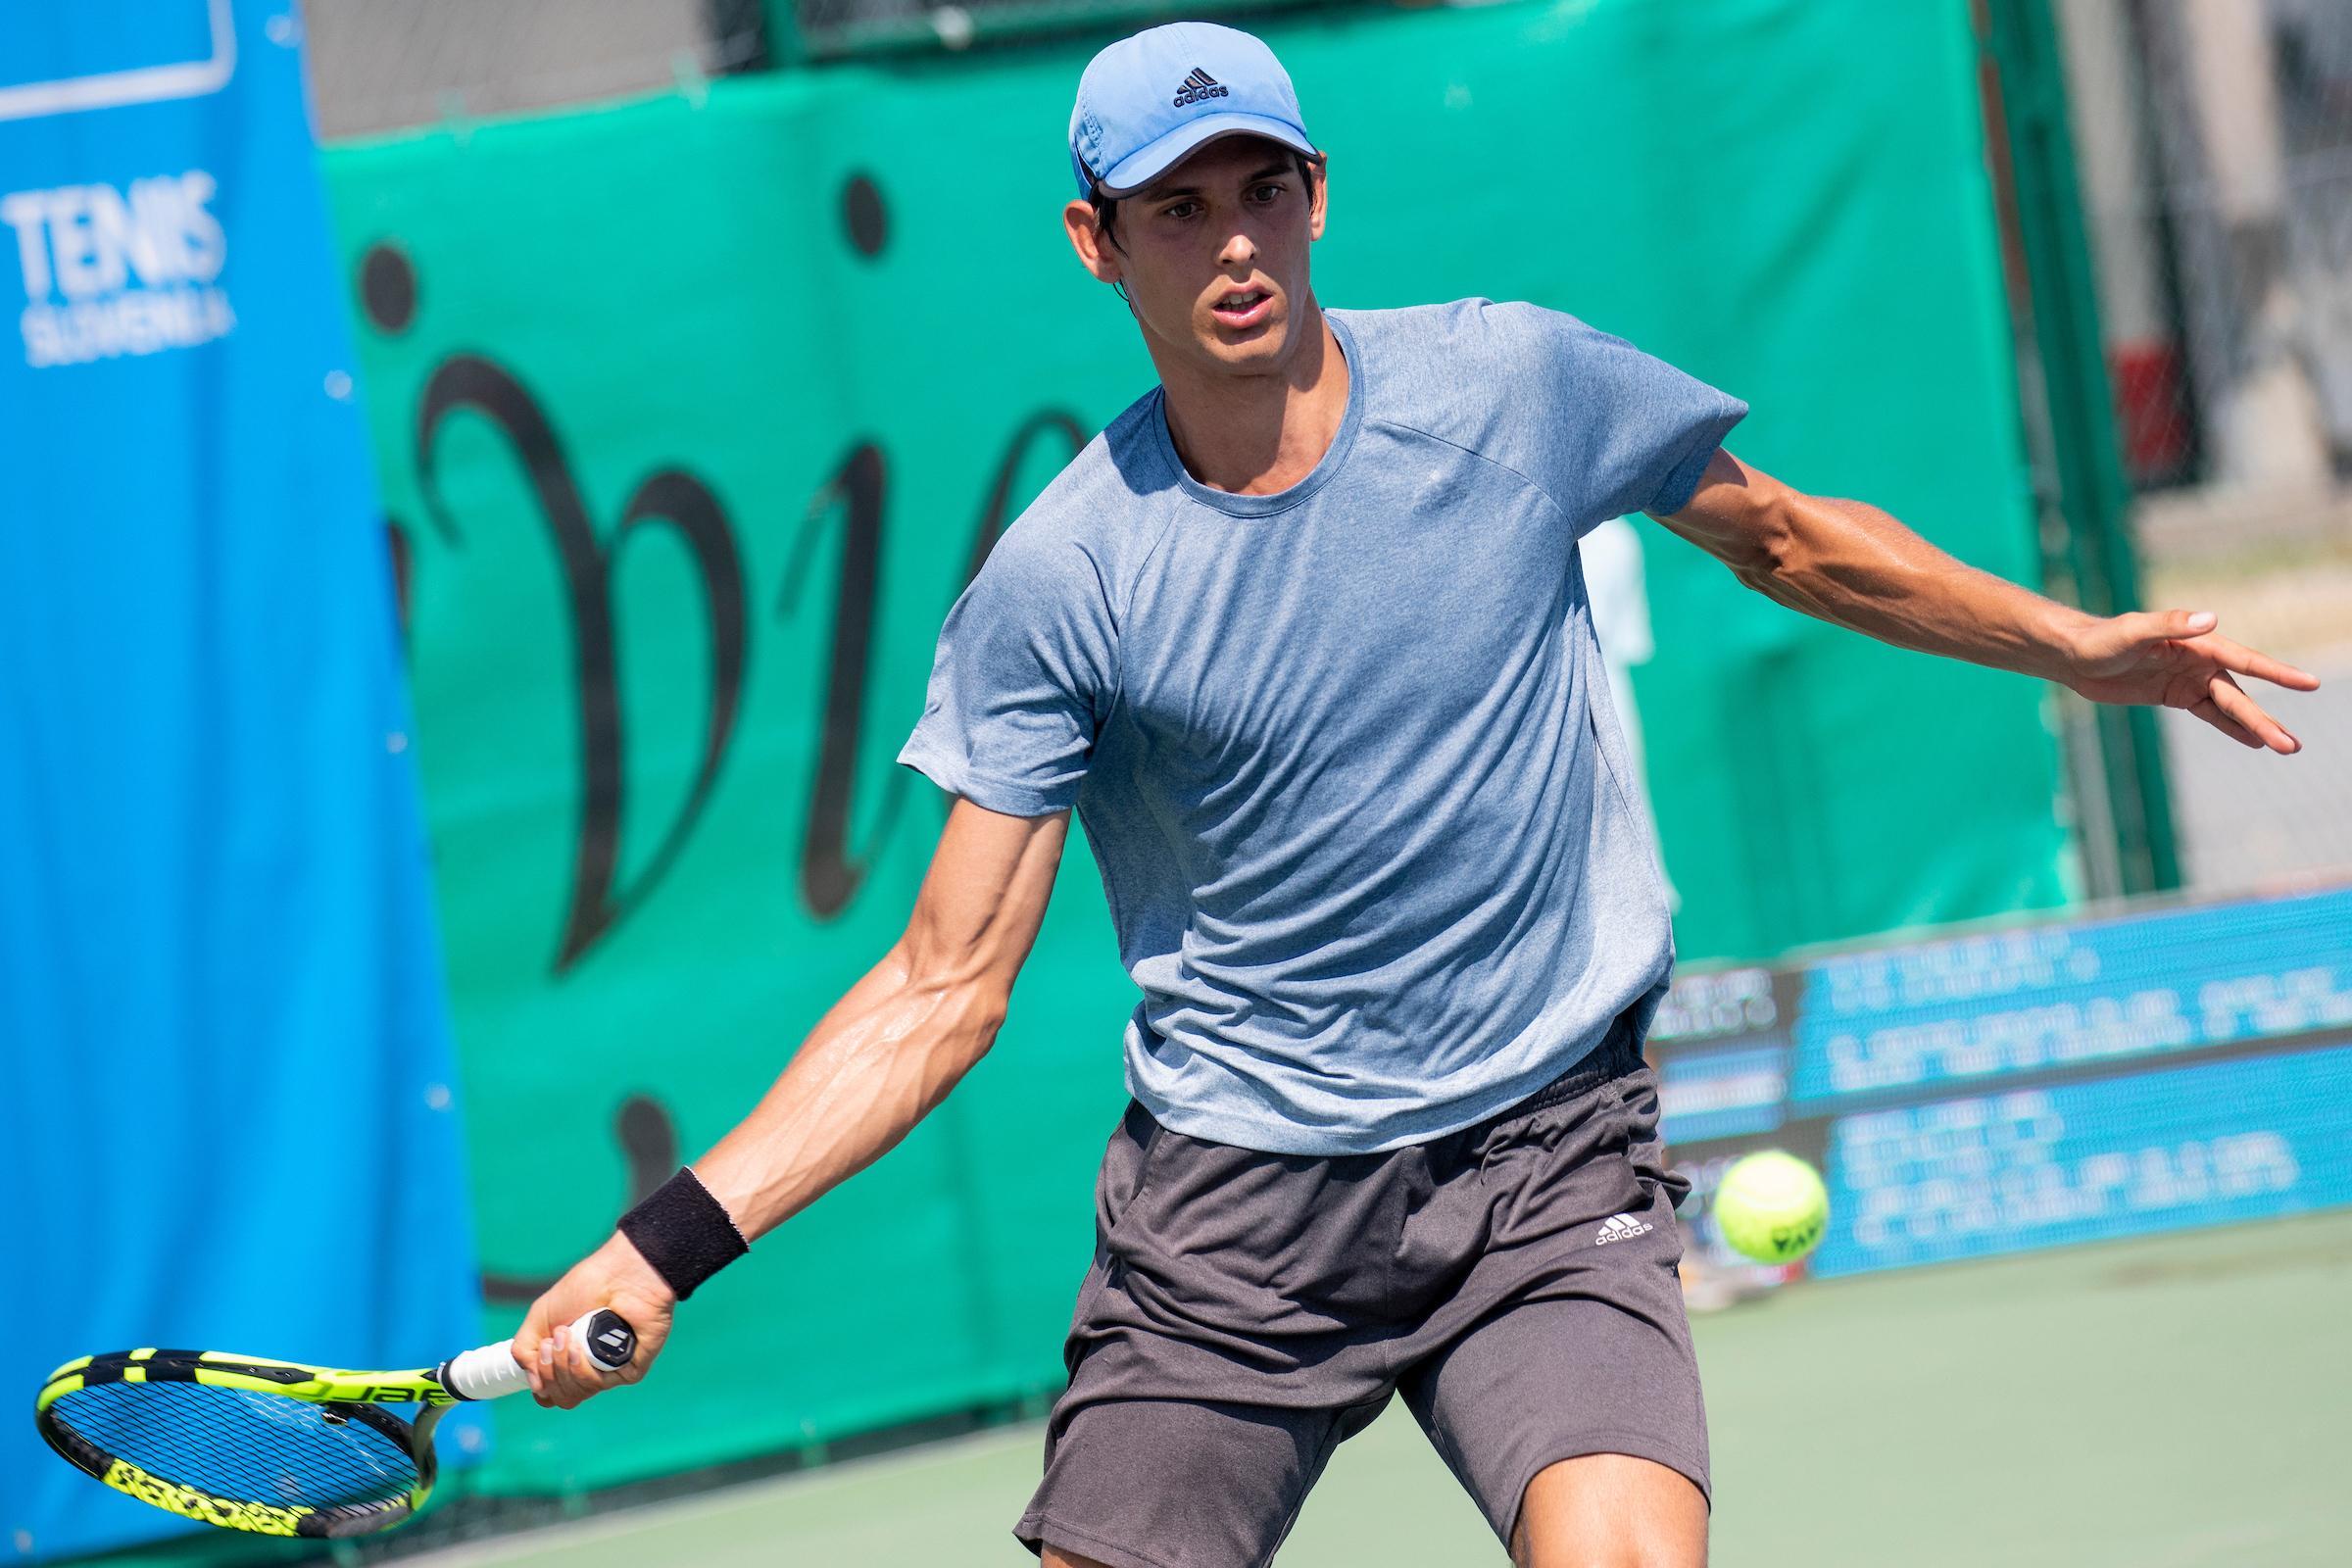 ATP Portoroz Tomas Lipovsek Puches - ITF: Britanka v četrtfinalu ustavila nalet Radišićeve, soigralec Lipovška Puchesa predal finale